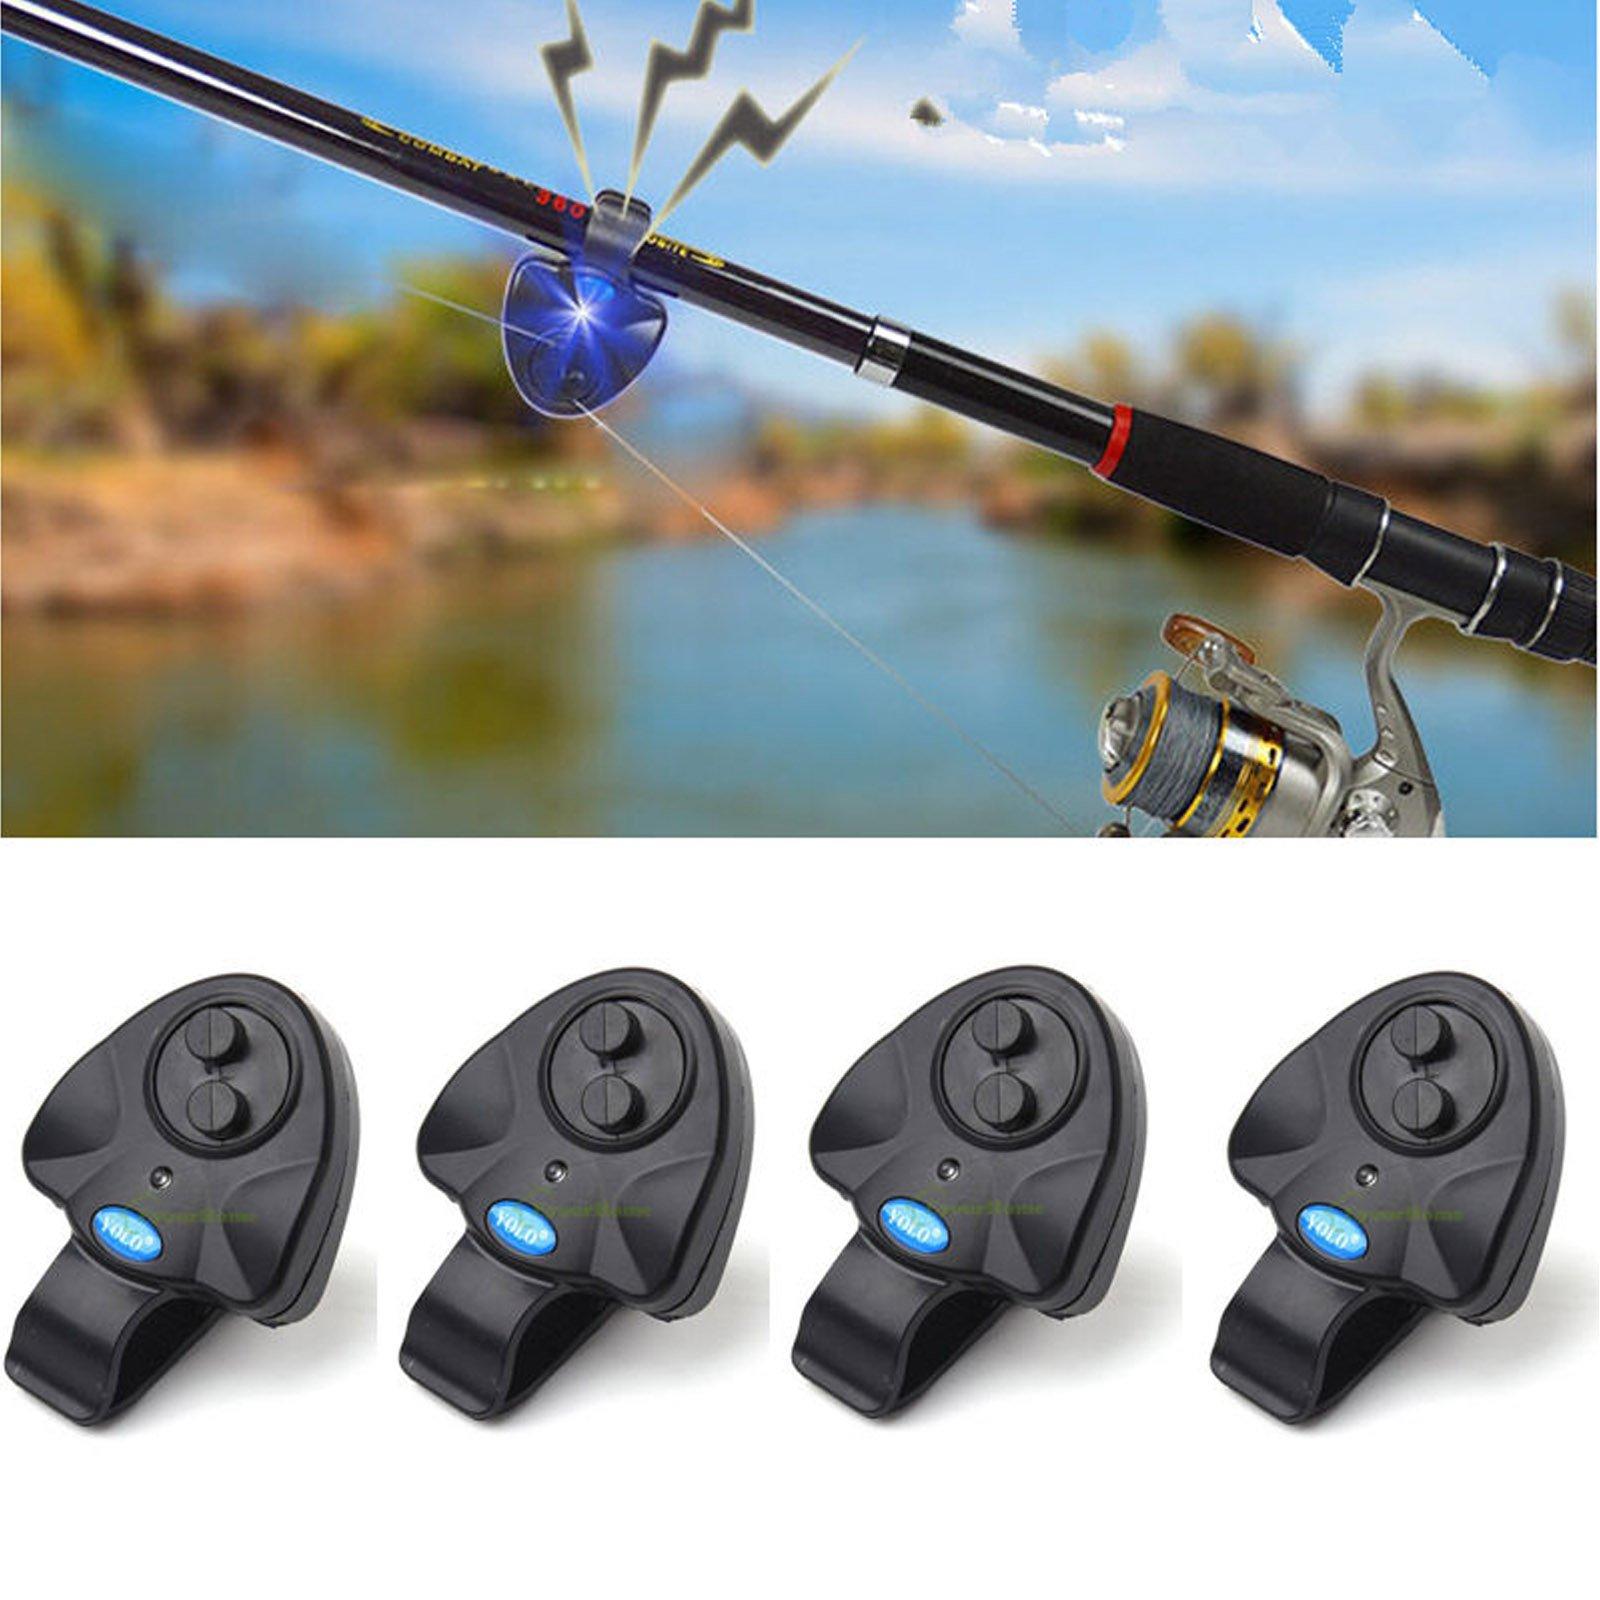 4 Pcs Black Electronic LED Light Fishing Bite Sound Alarm Alert Bell Clip On Fishing Rod by wingsflying